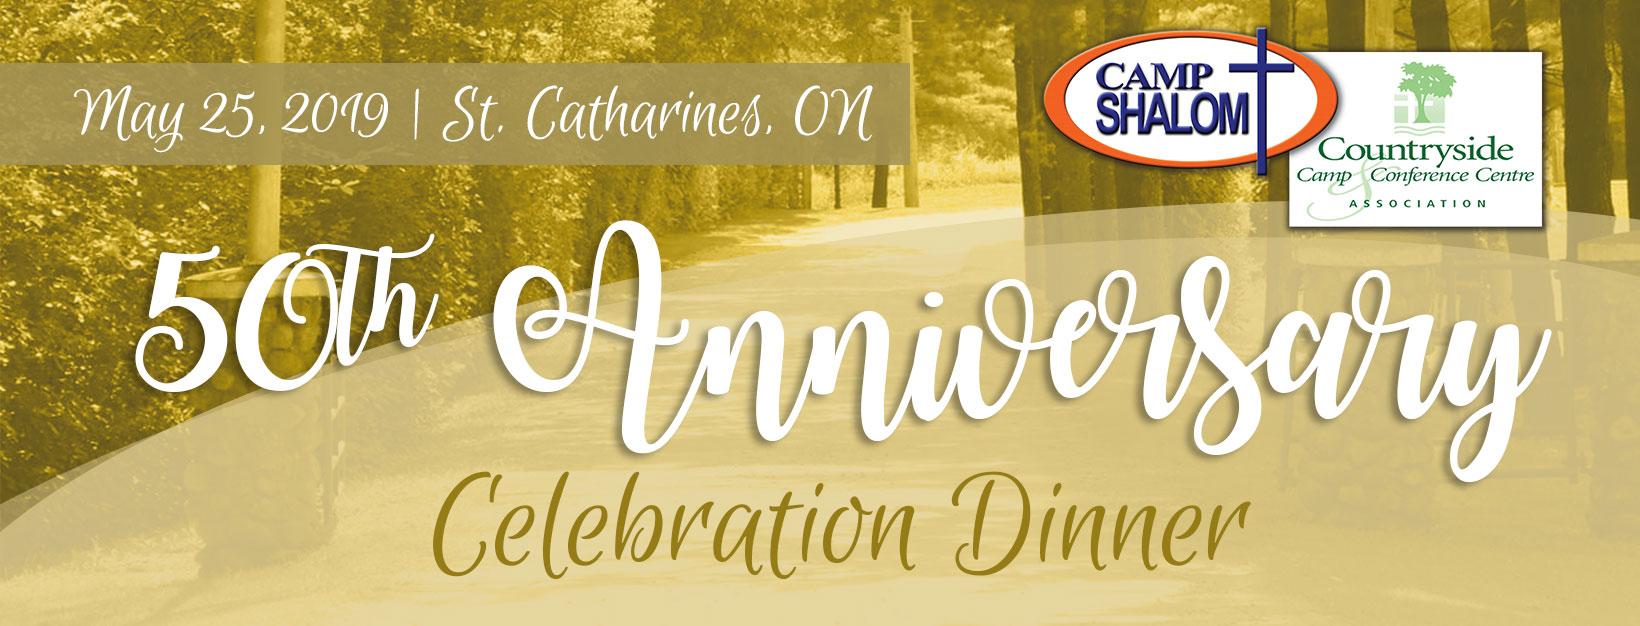 50th Anniversary Celebration Dinner for Camp Shalom